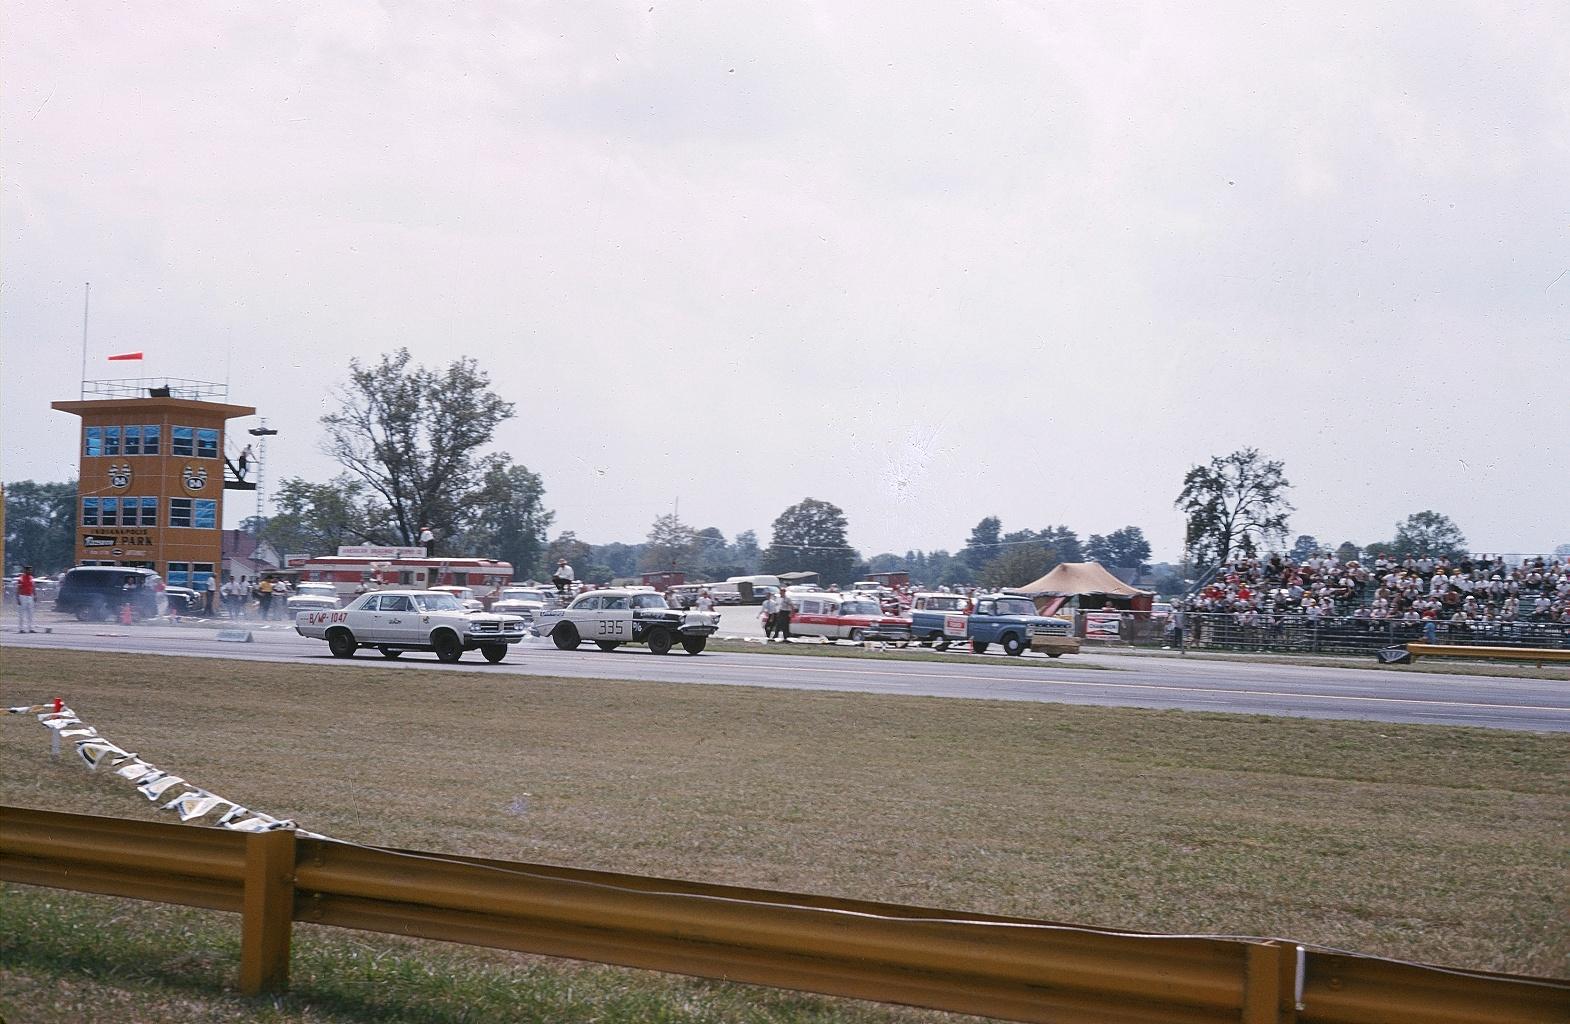 macs cars Picture 248.jpg